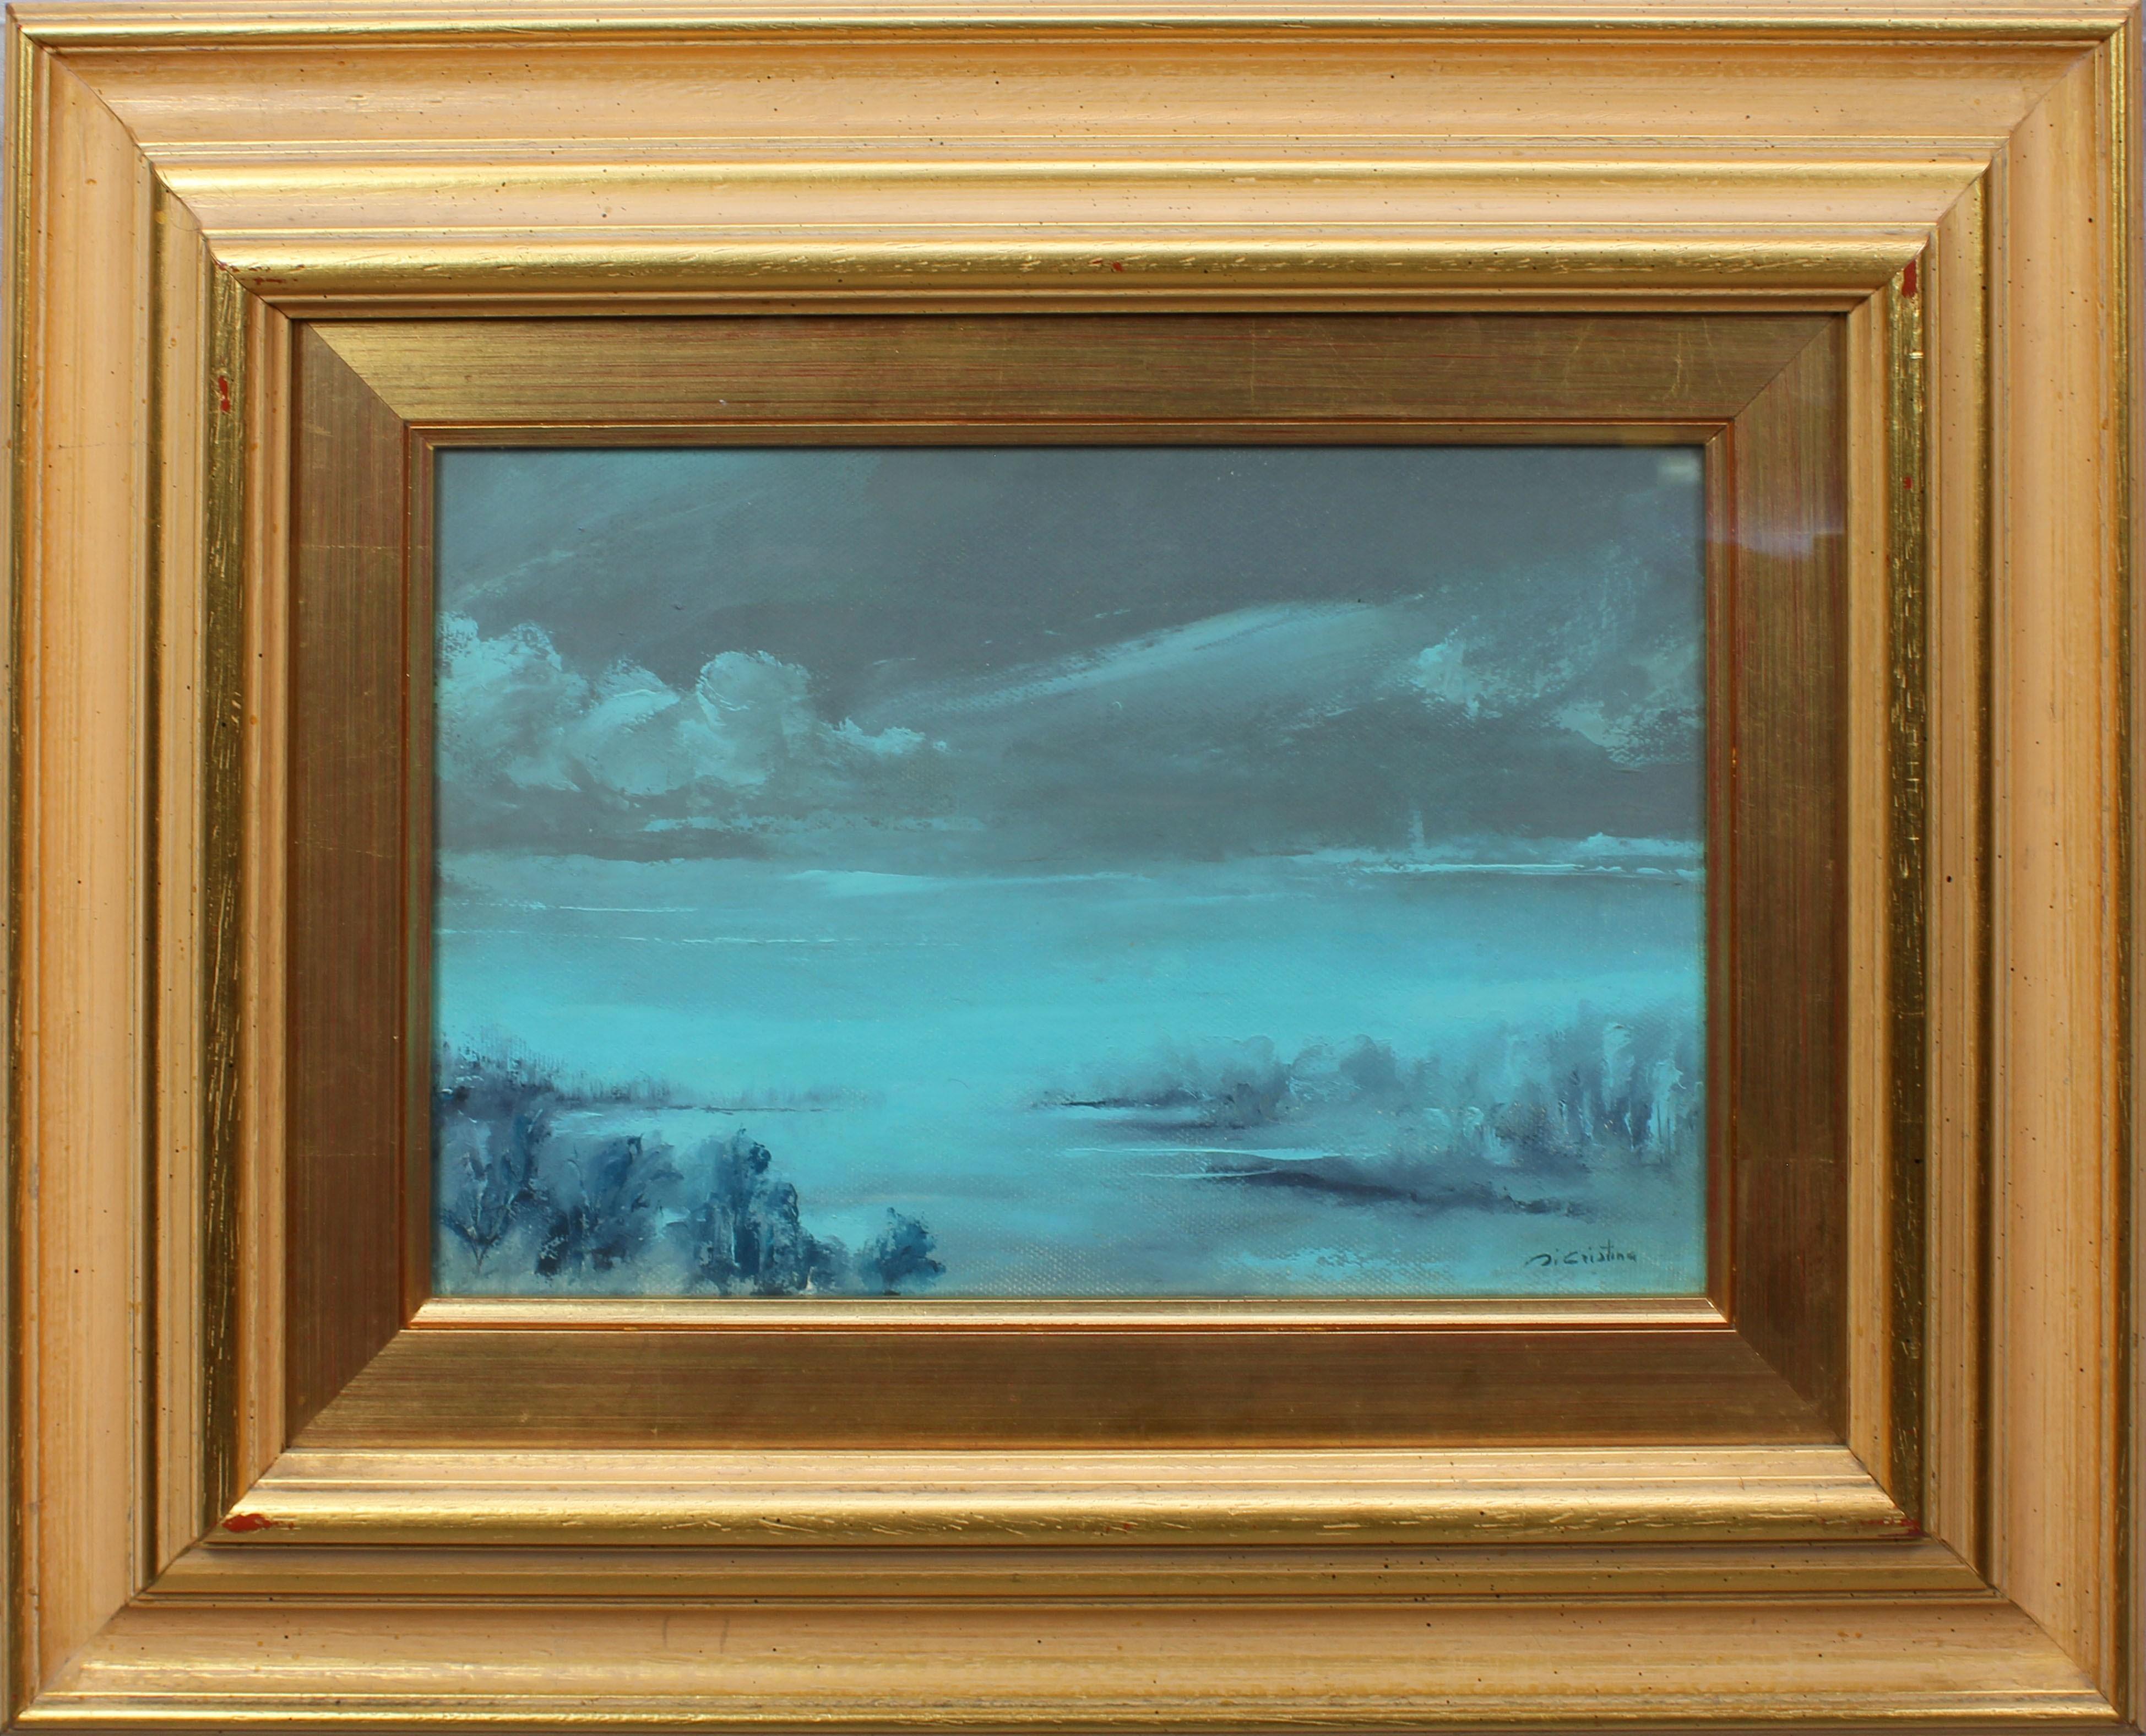 Lot 28 - Paesaggio lacustre a firma Di Cristina, cm. 29x19